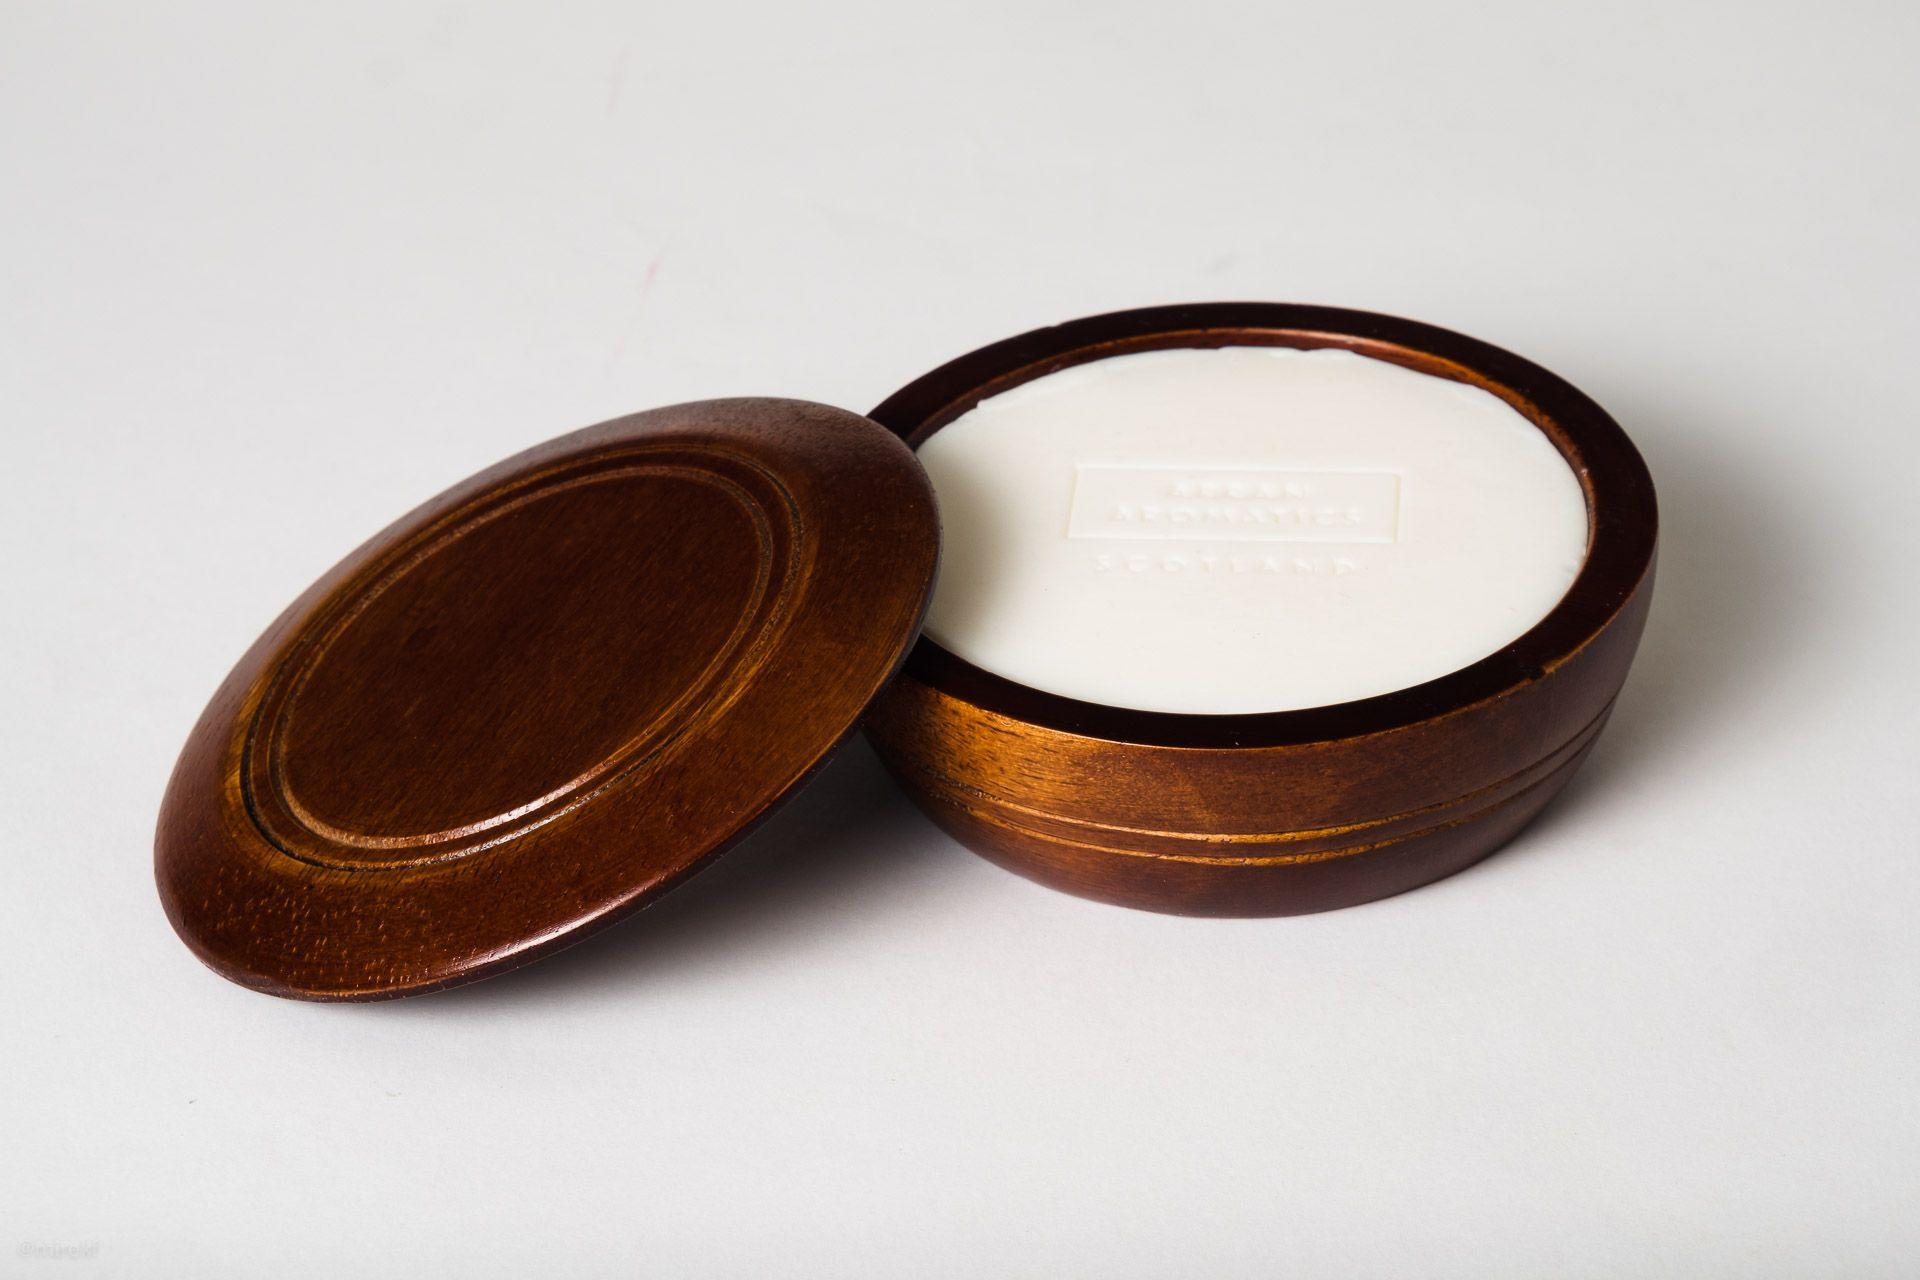 Opakowanie mydła Arran Aromatics Driftwood Shaving Soap